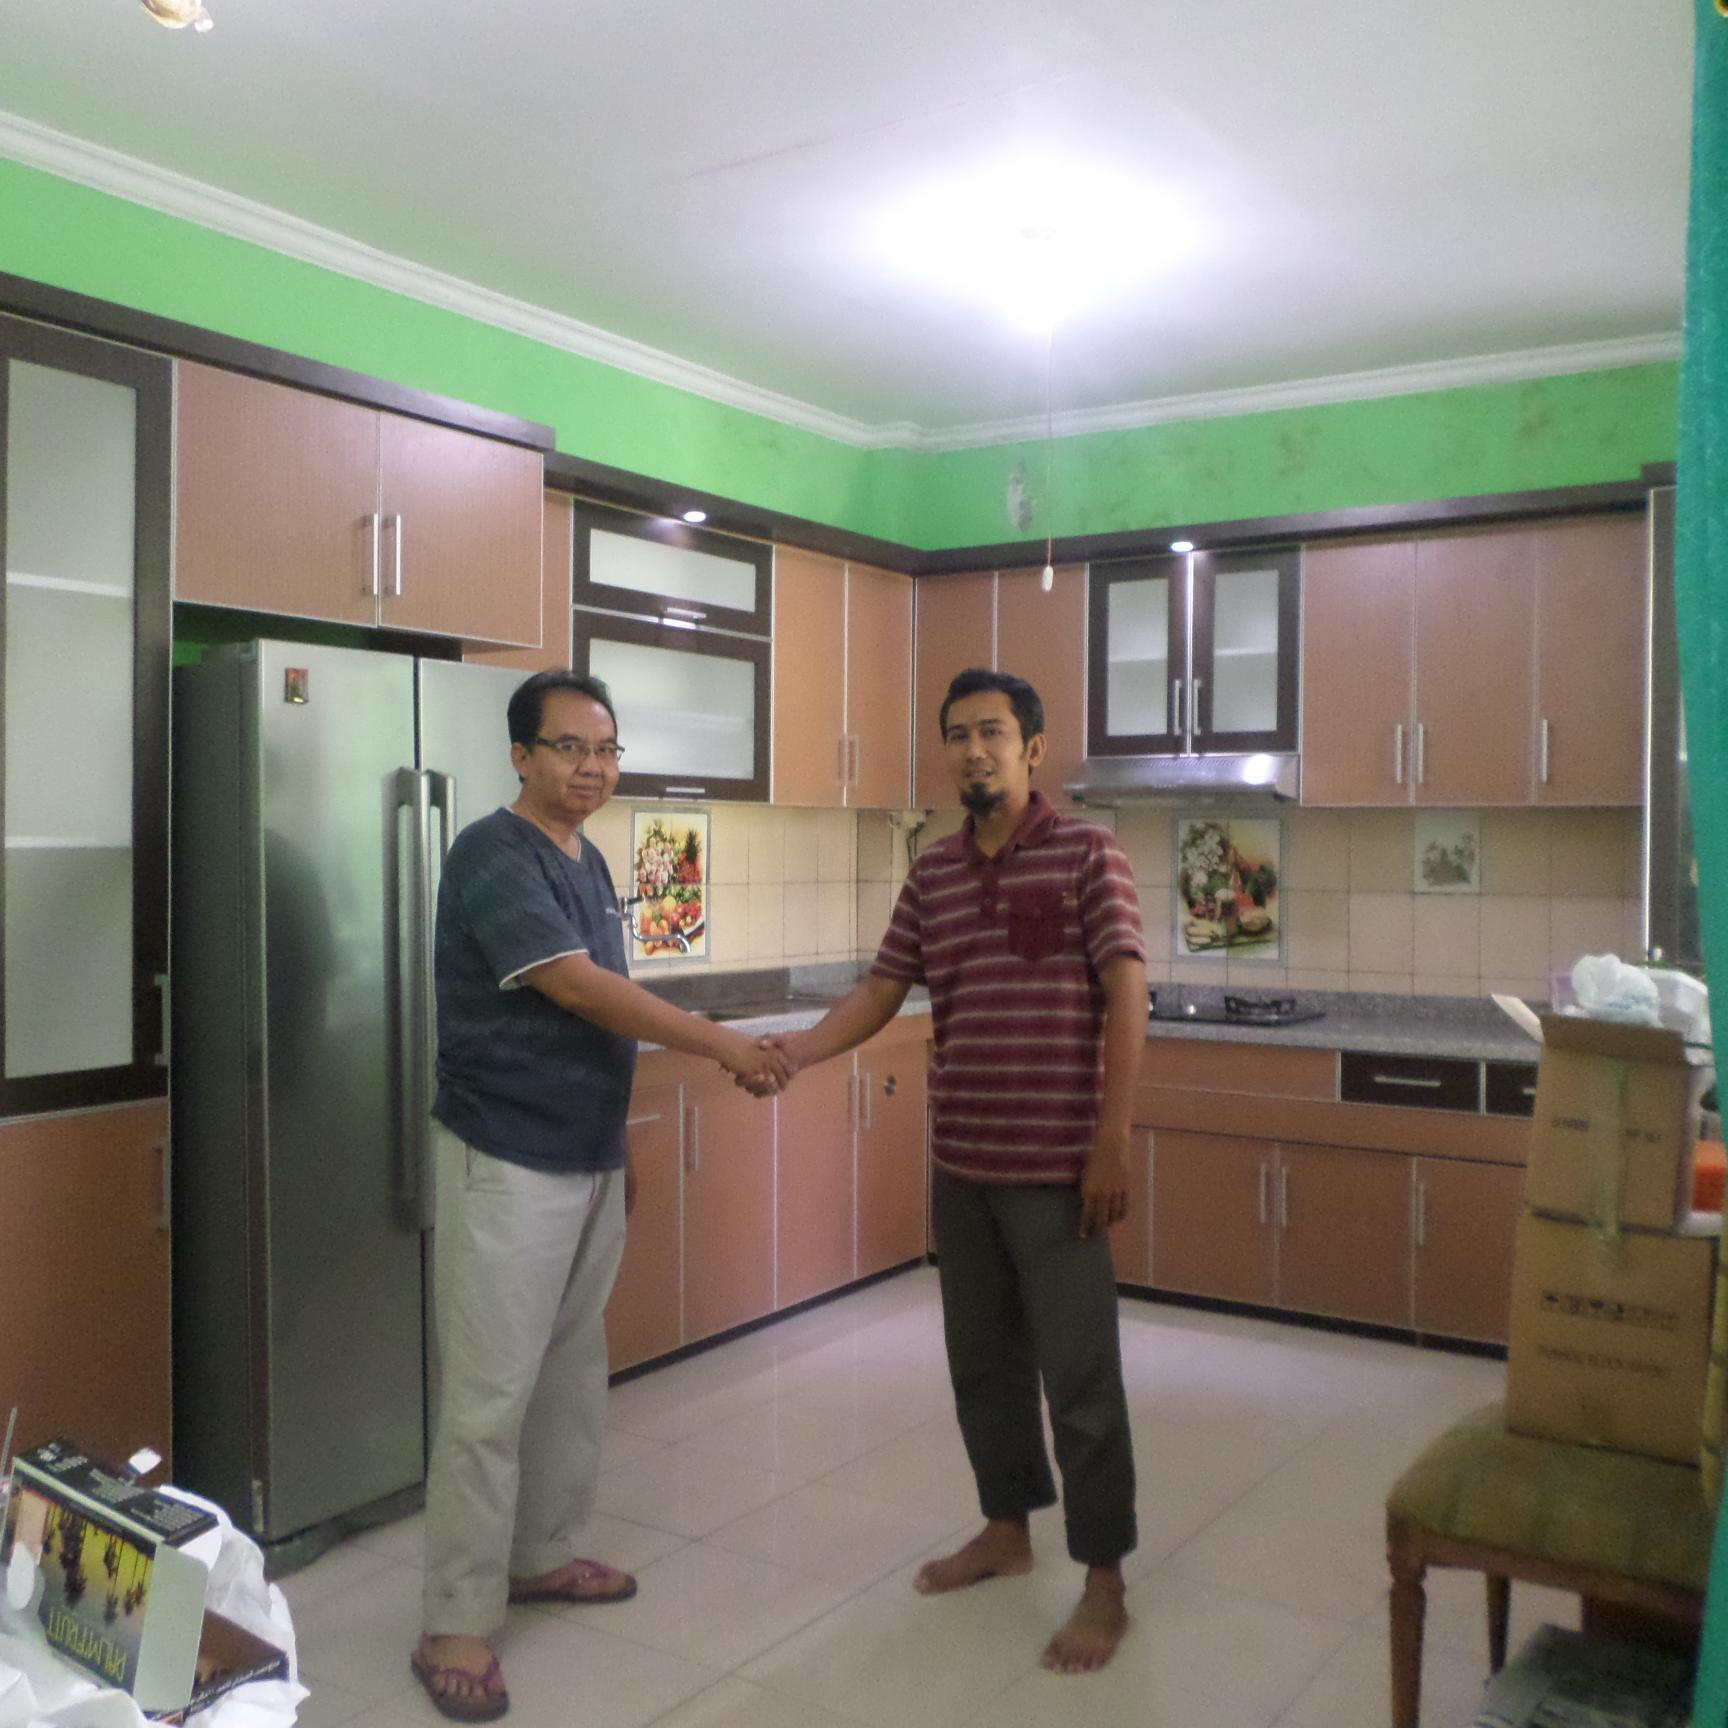 Dapur kitchen set dkitchenset twitter for Dapur kitchen set